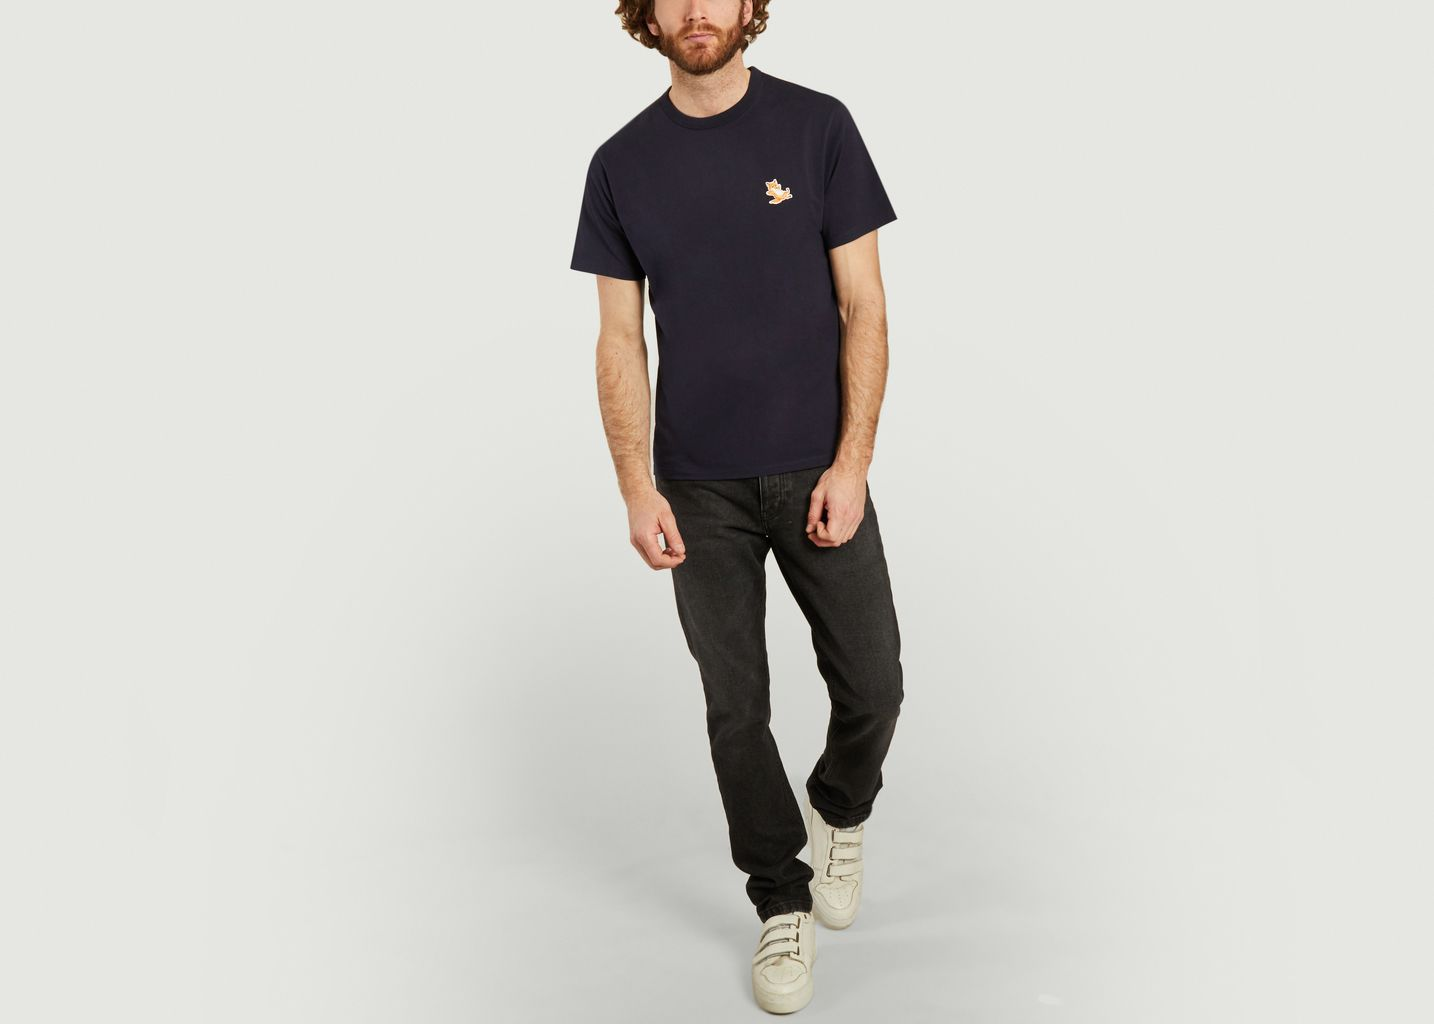 Classic Chillax Fox Patch T-Shirt - Maison Kitsuné